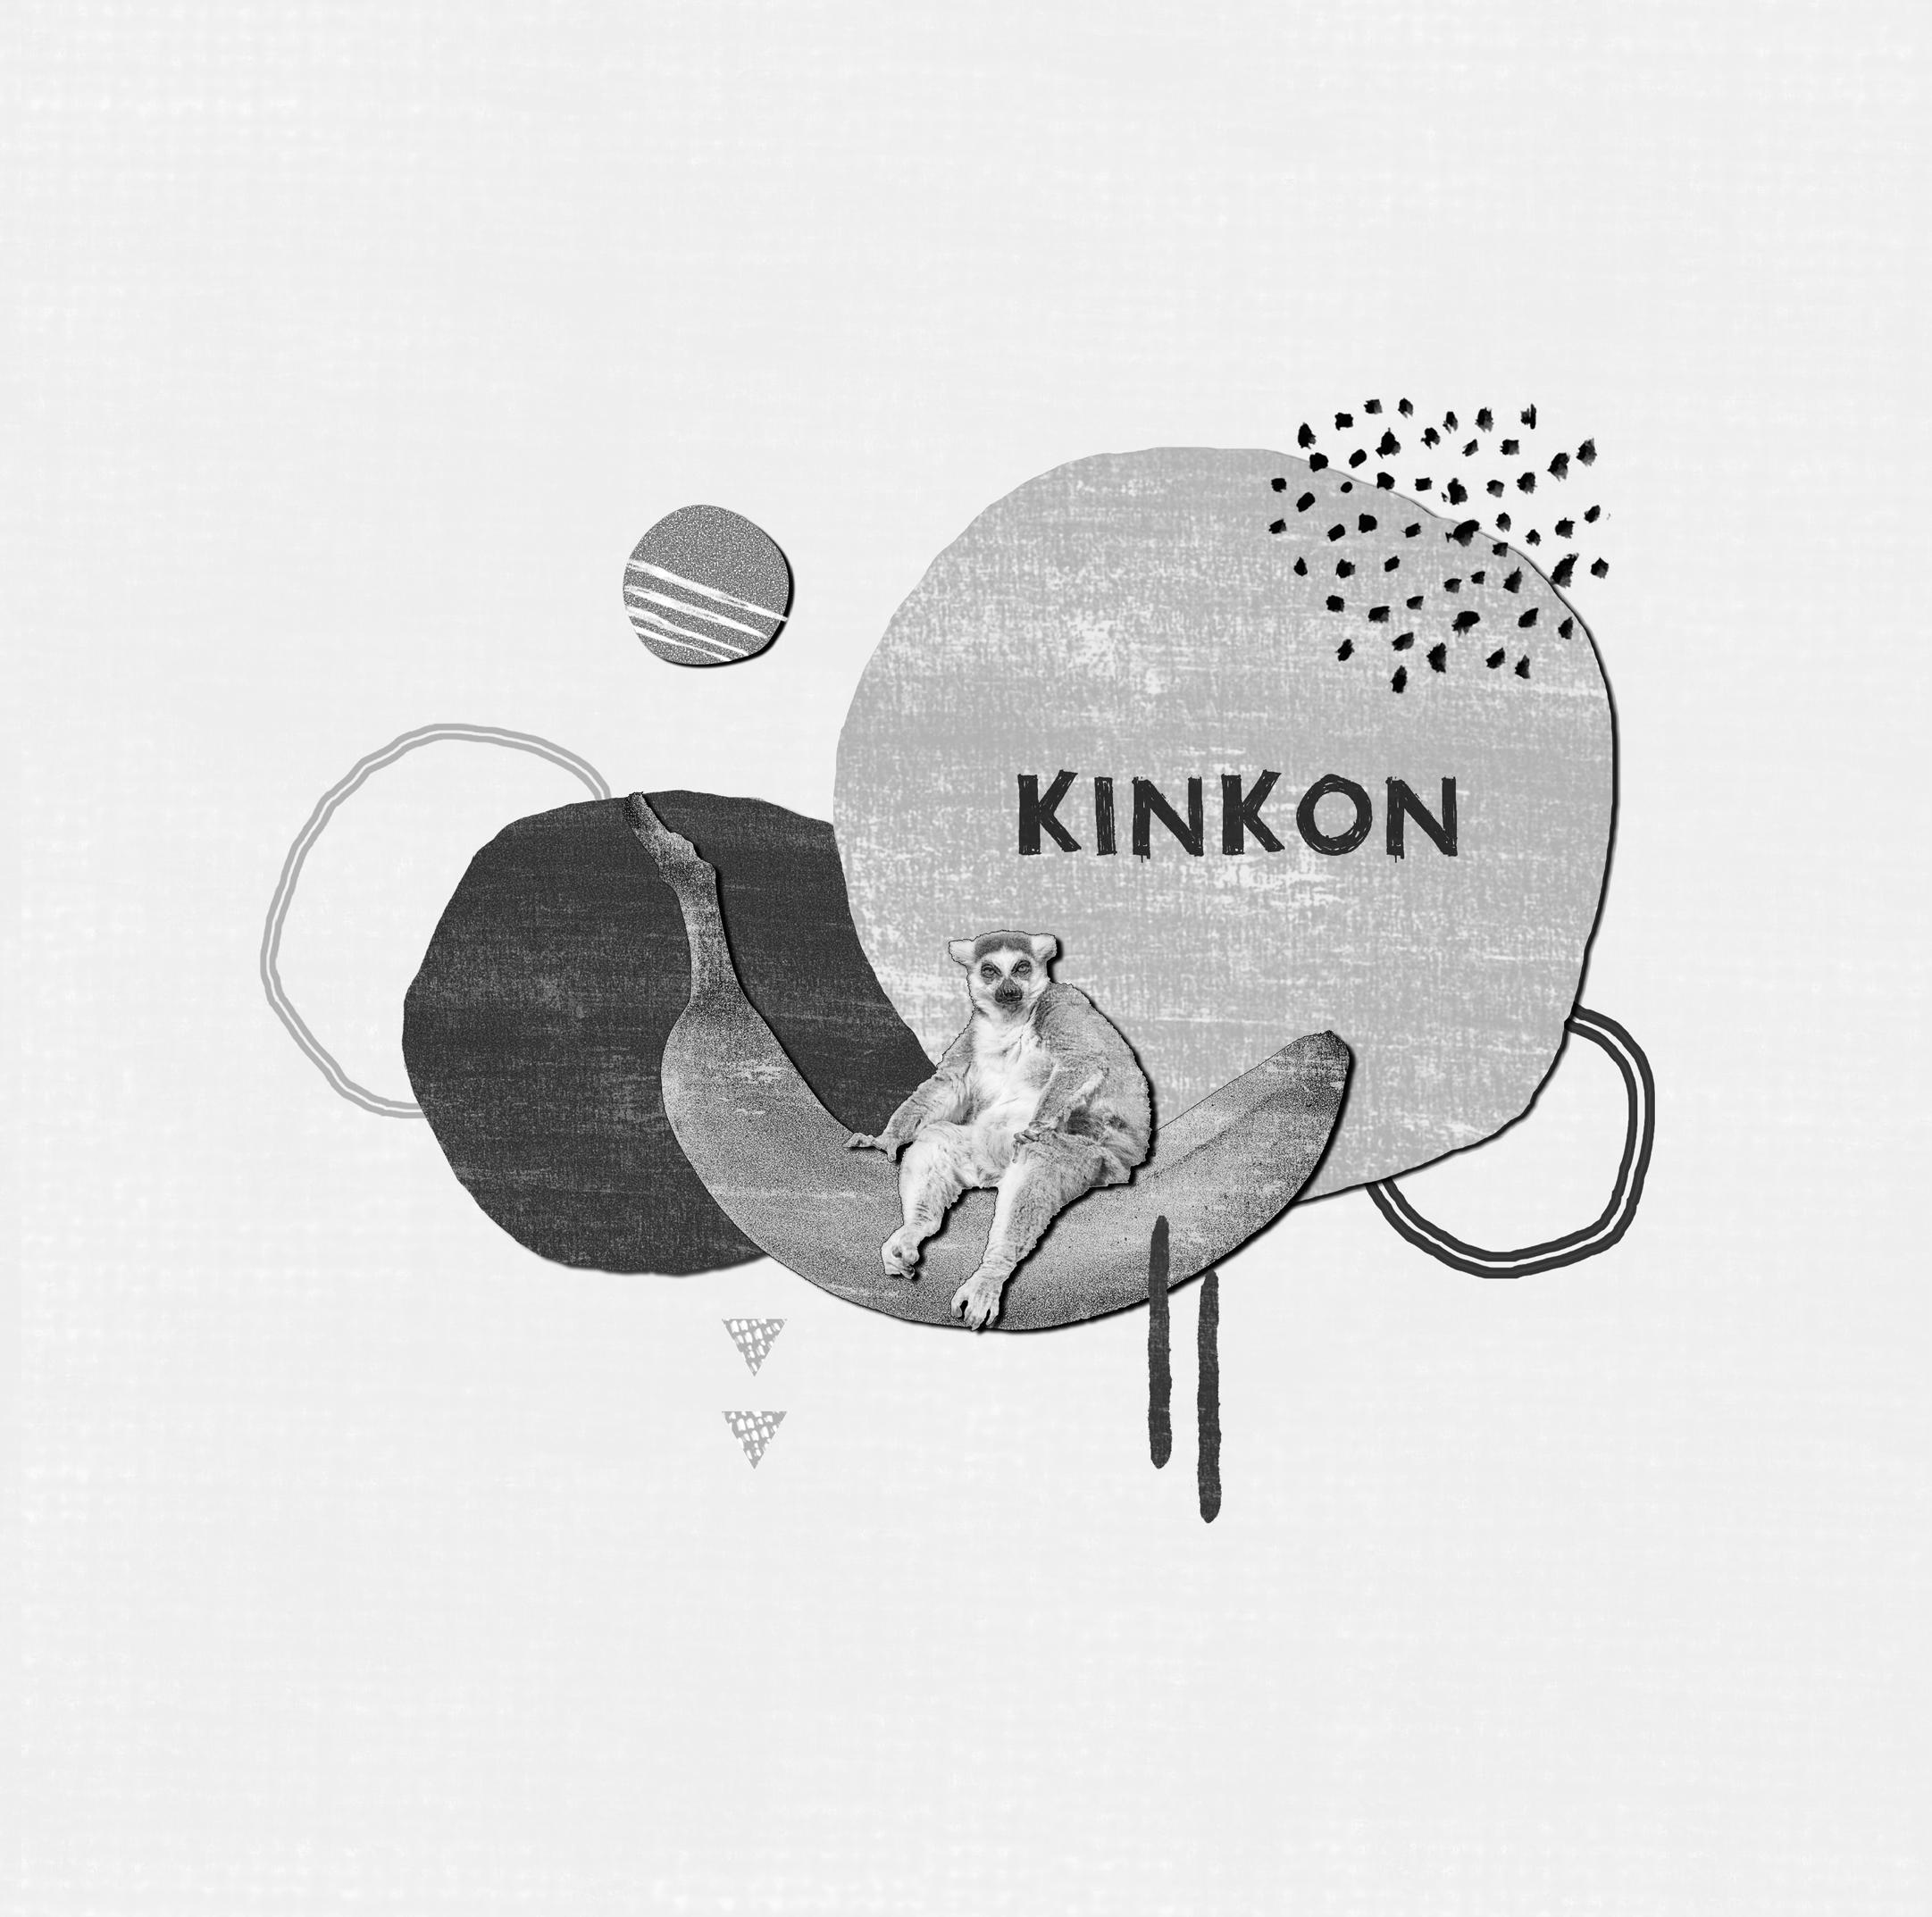 KinKon_Cover_Final_Endformat-01_SW